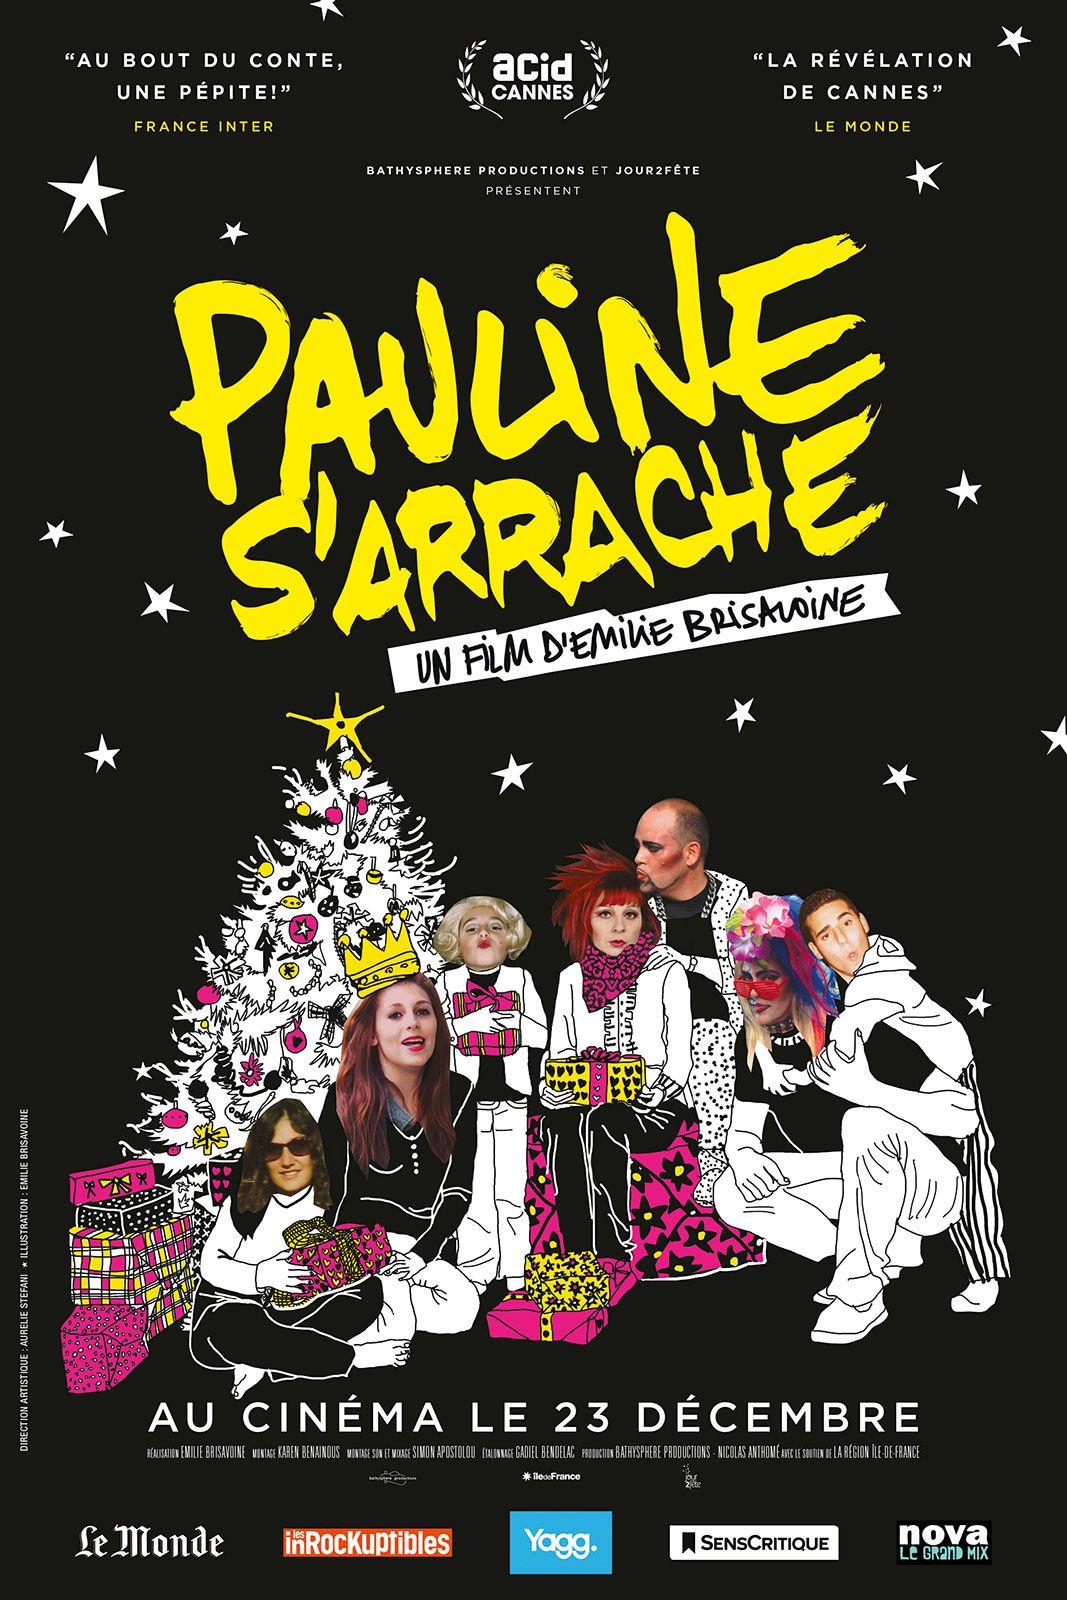 Pauline s'arrache - Documentaire (2015)